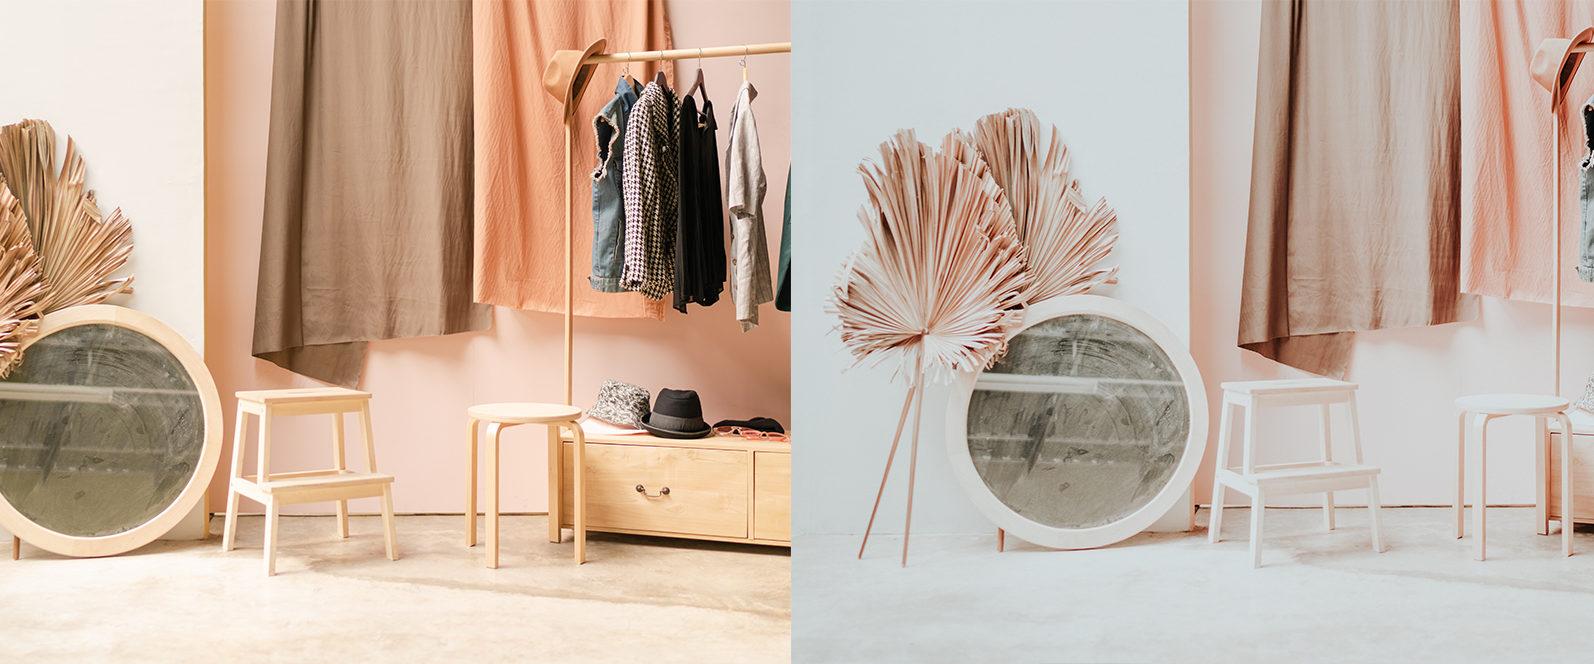 9 x Bohemian inspired lightroom presets   Desktop + Mobile - Bohemian Preview 8 -